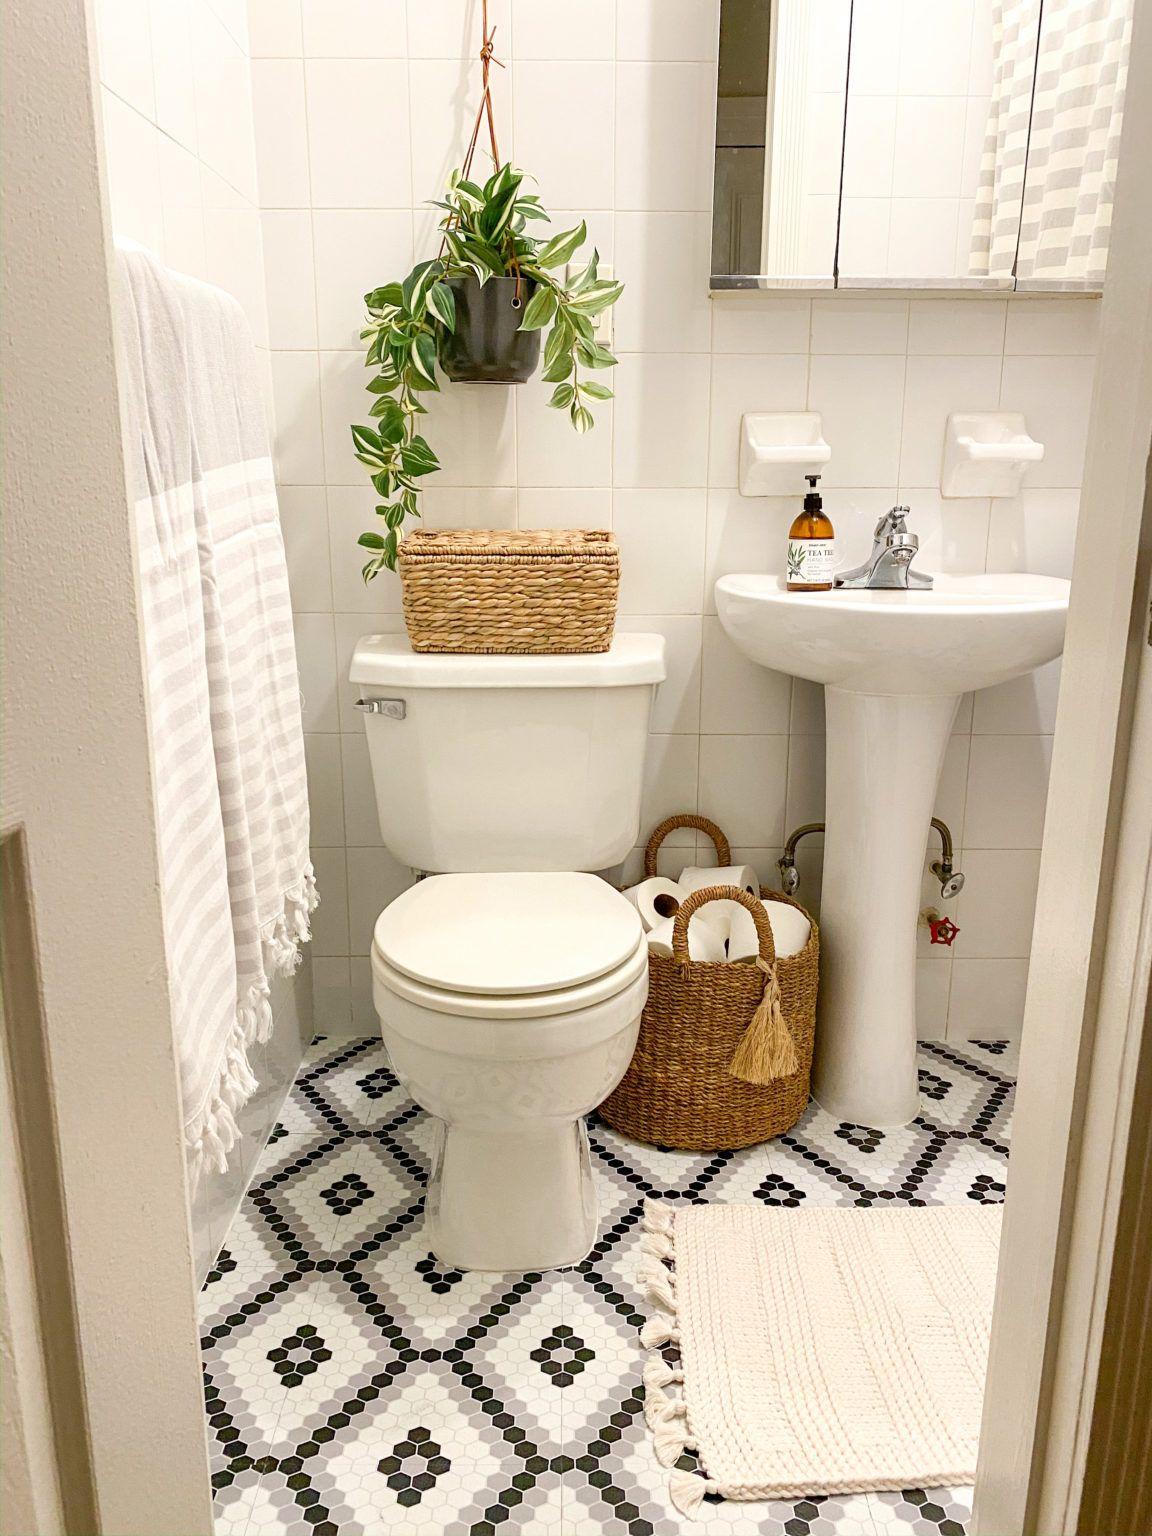 NYC Rental Bathroom Makeover with floor tiles